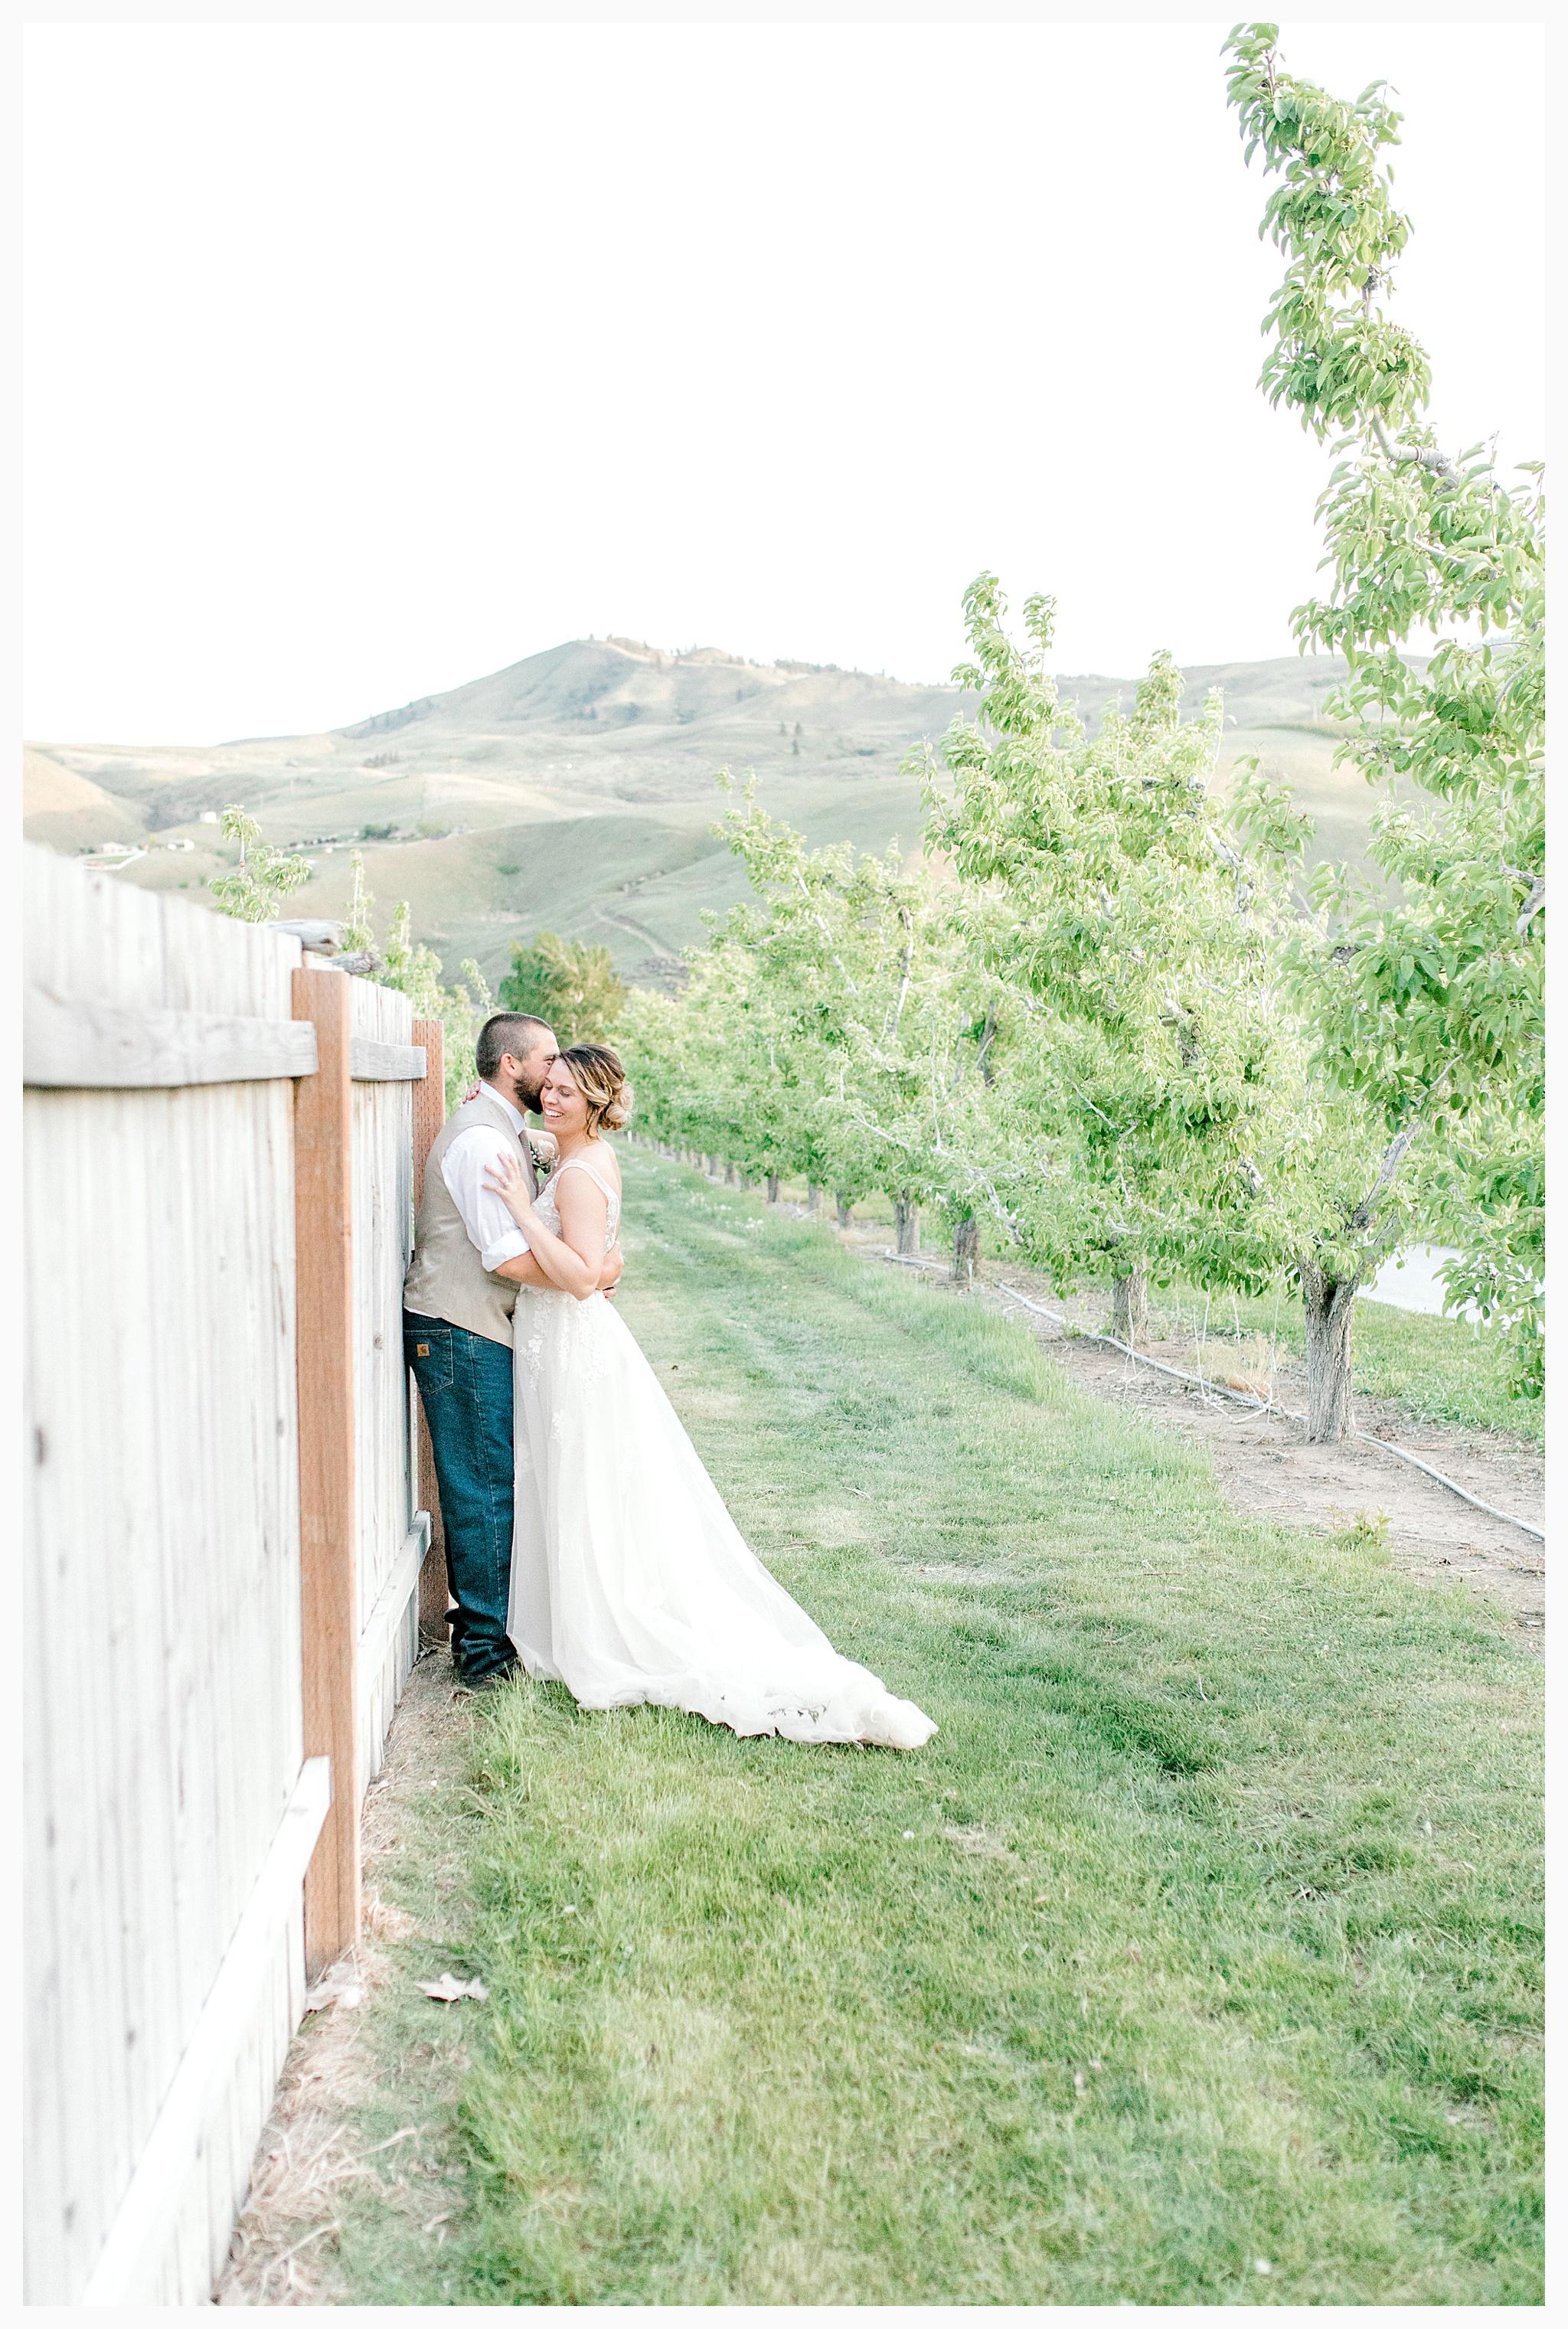 Rustic barn wedding in Wenatchee Washington at Sunshine Ranch on Easy Street, Emma Rose Company Seattle PNW Light and Airy Wedding Photographer_0142.jpg